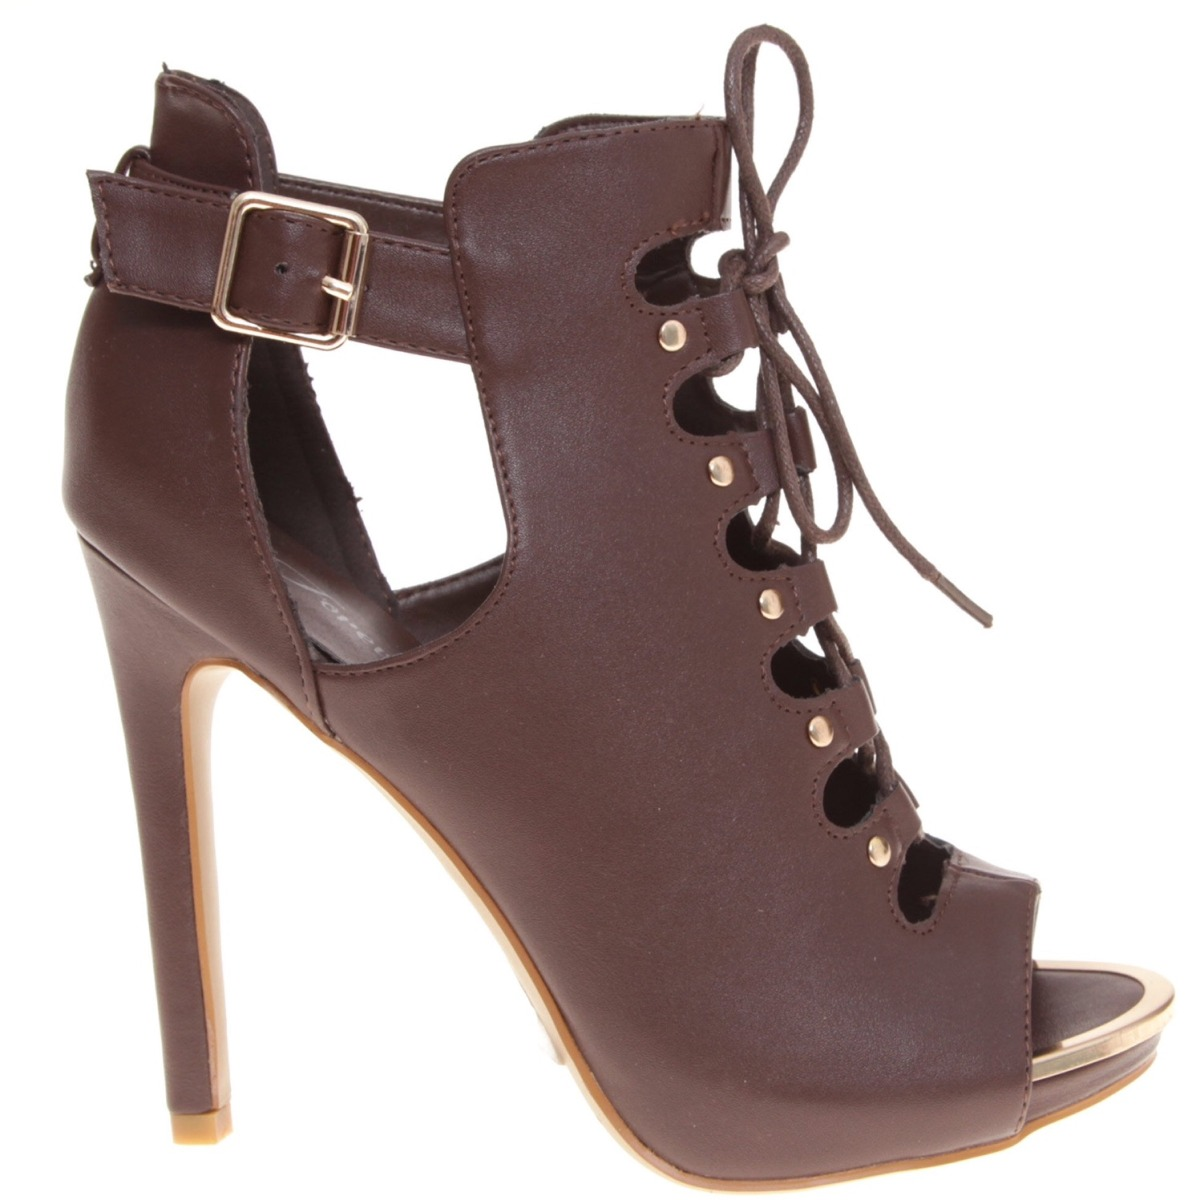 bfec25b5ab4 botín bota pep toe fashion casual caoba cafe chocolate 25.5m. Cargando zoom.